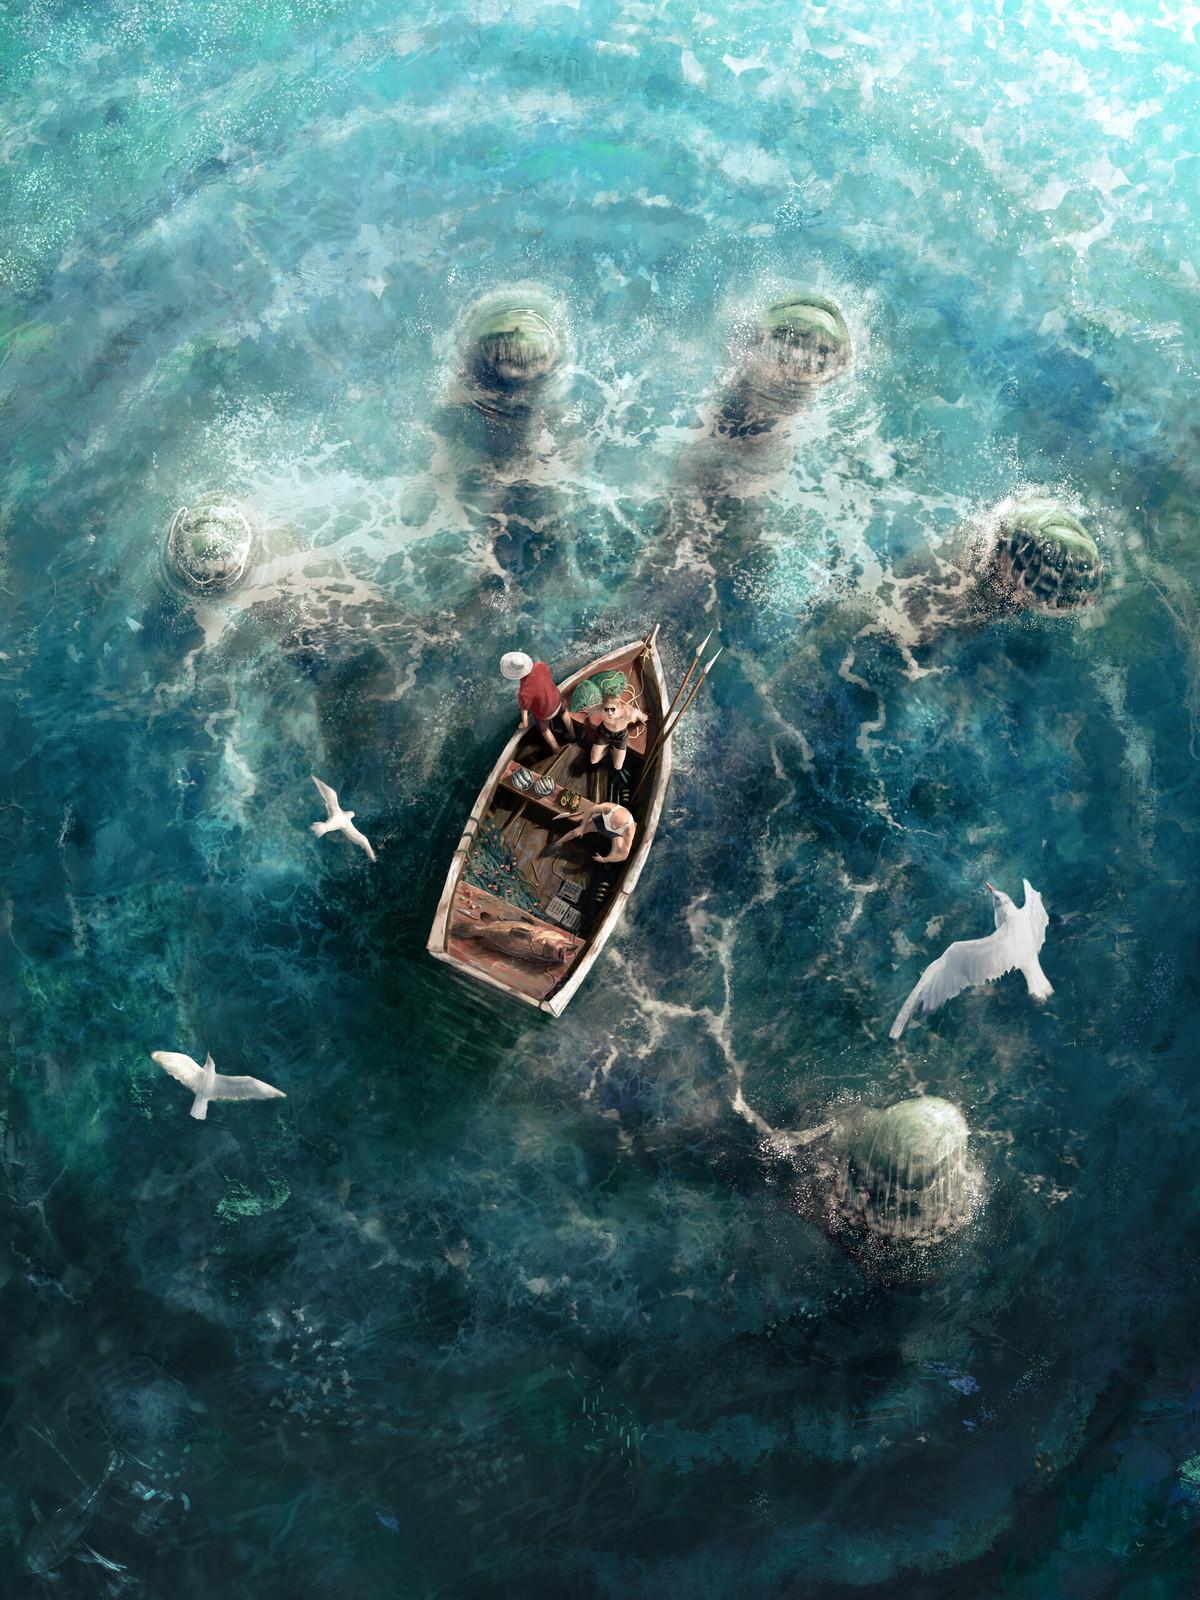 Rise of Cthulhu by Randi Sánchez Verduga. .. That hits my nope buttom